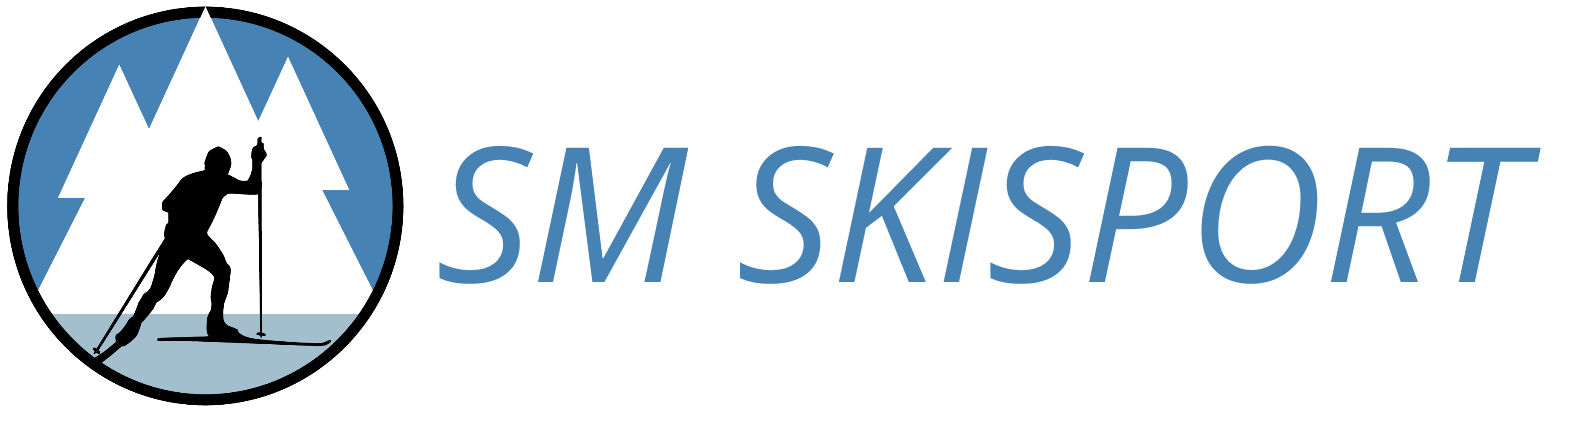 SM SKISPORT